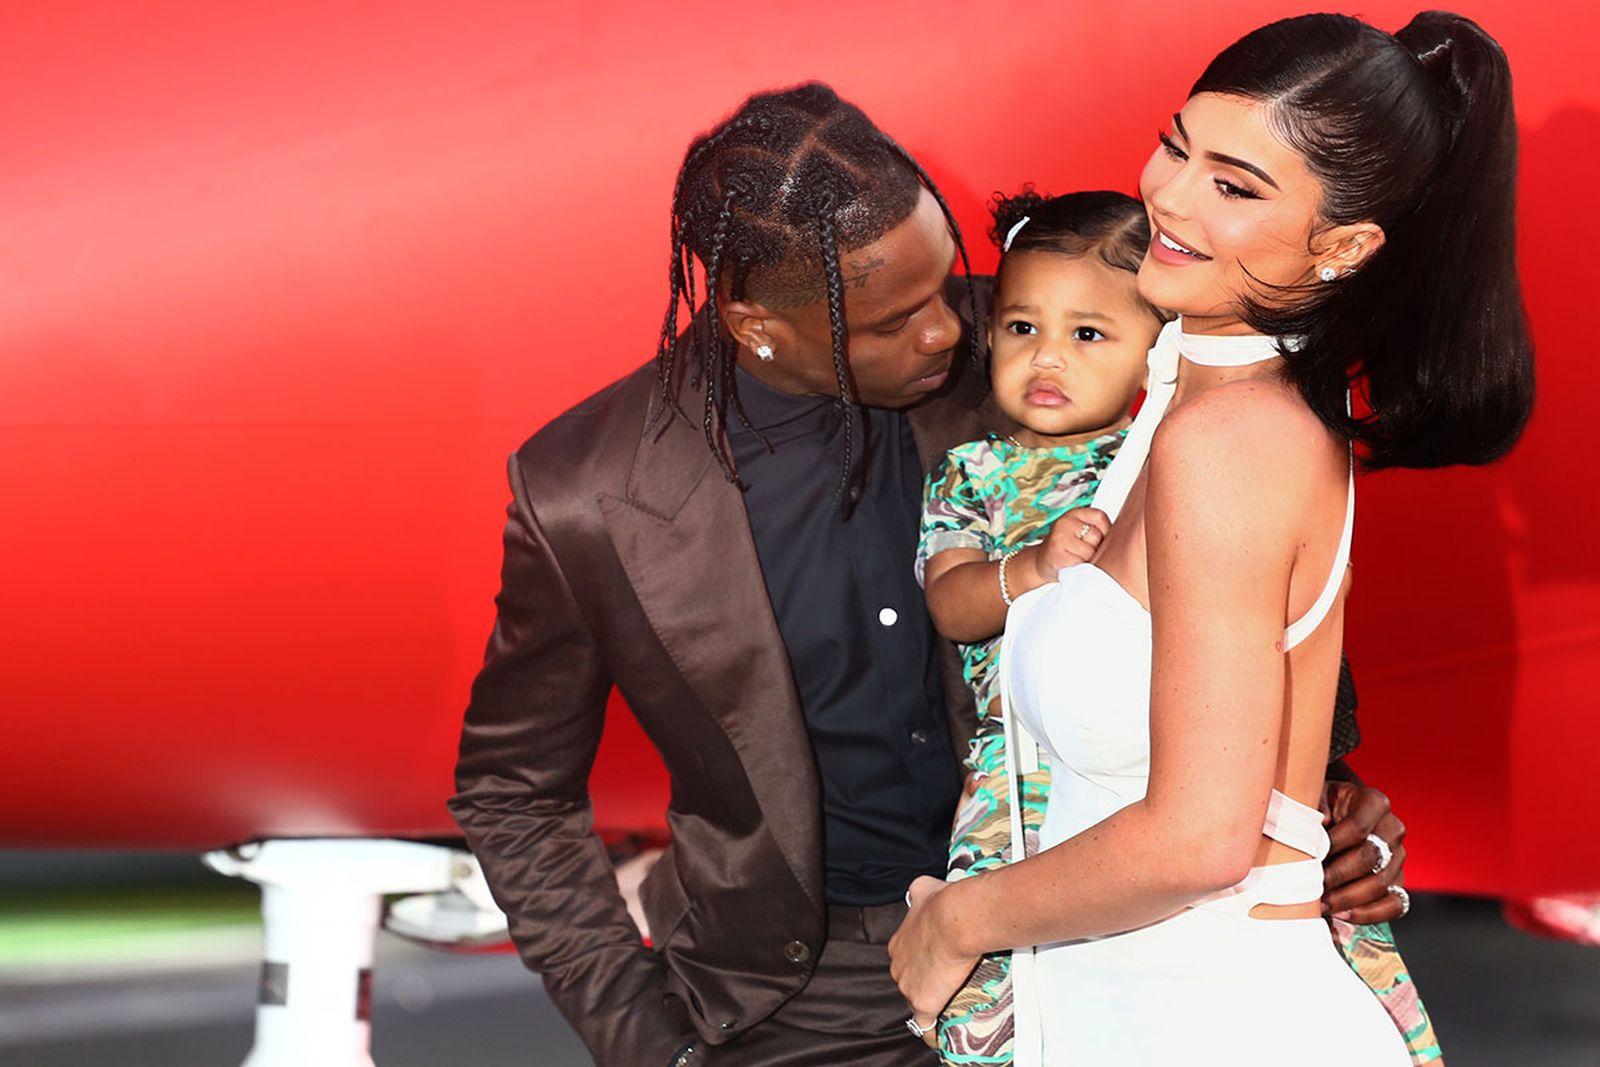 Travis Scott, Kylie Jenner and daughter stormi webster